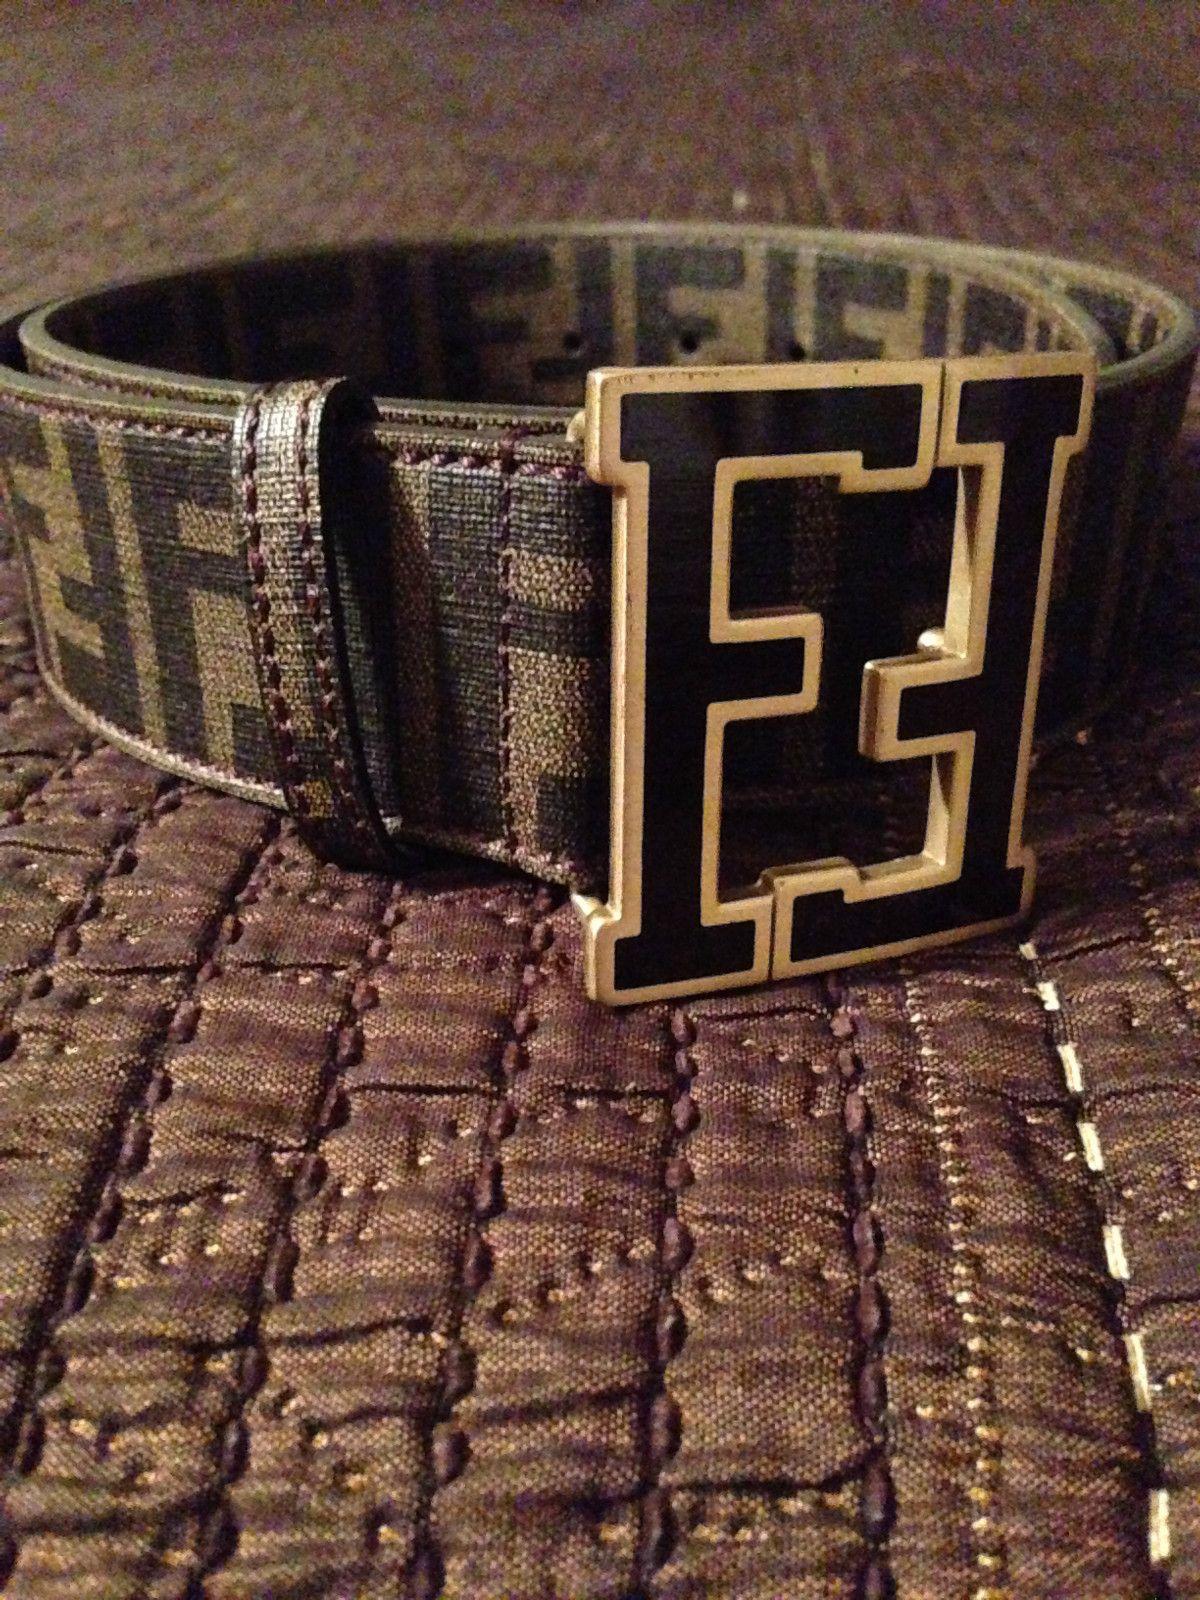 504b3bda75 Fendi Belt (Men's Pre-owned Double F Logo Buckle Brown & Black ...